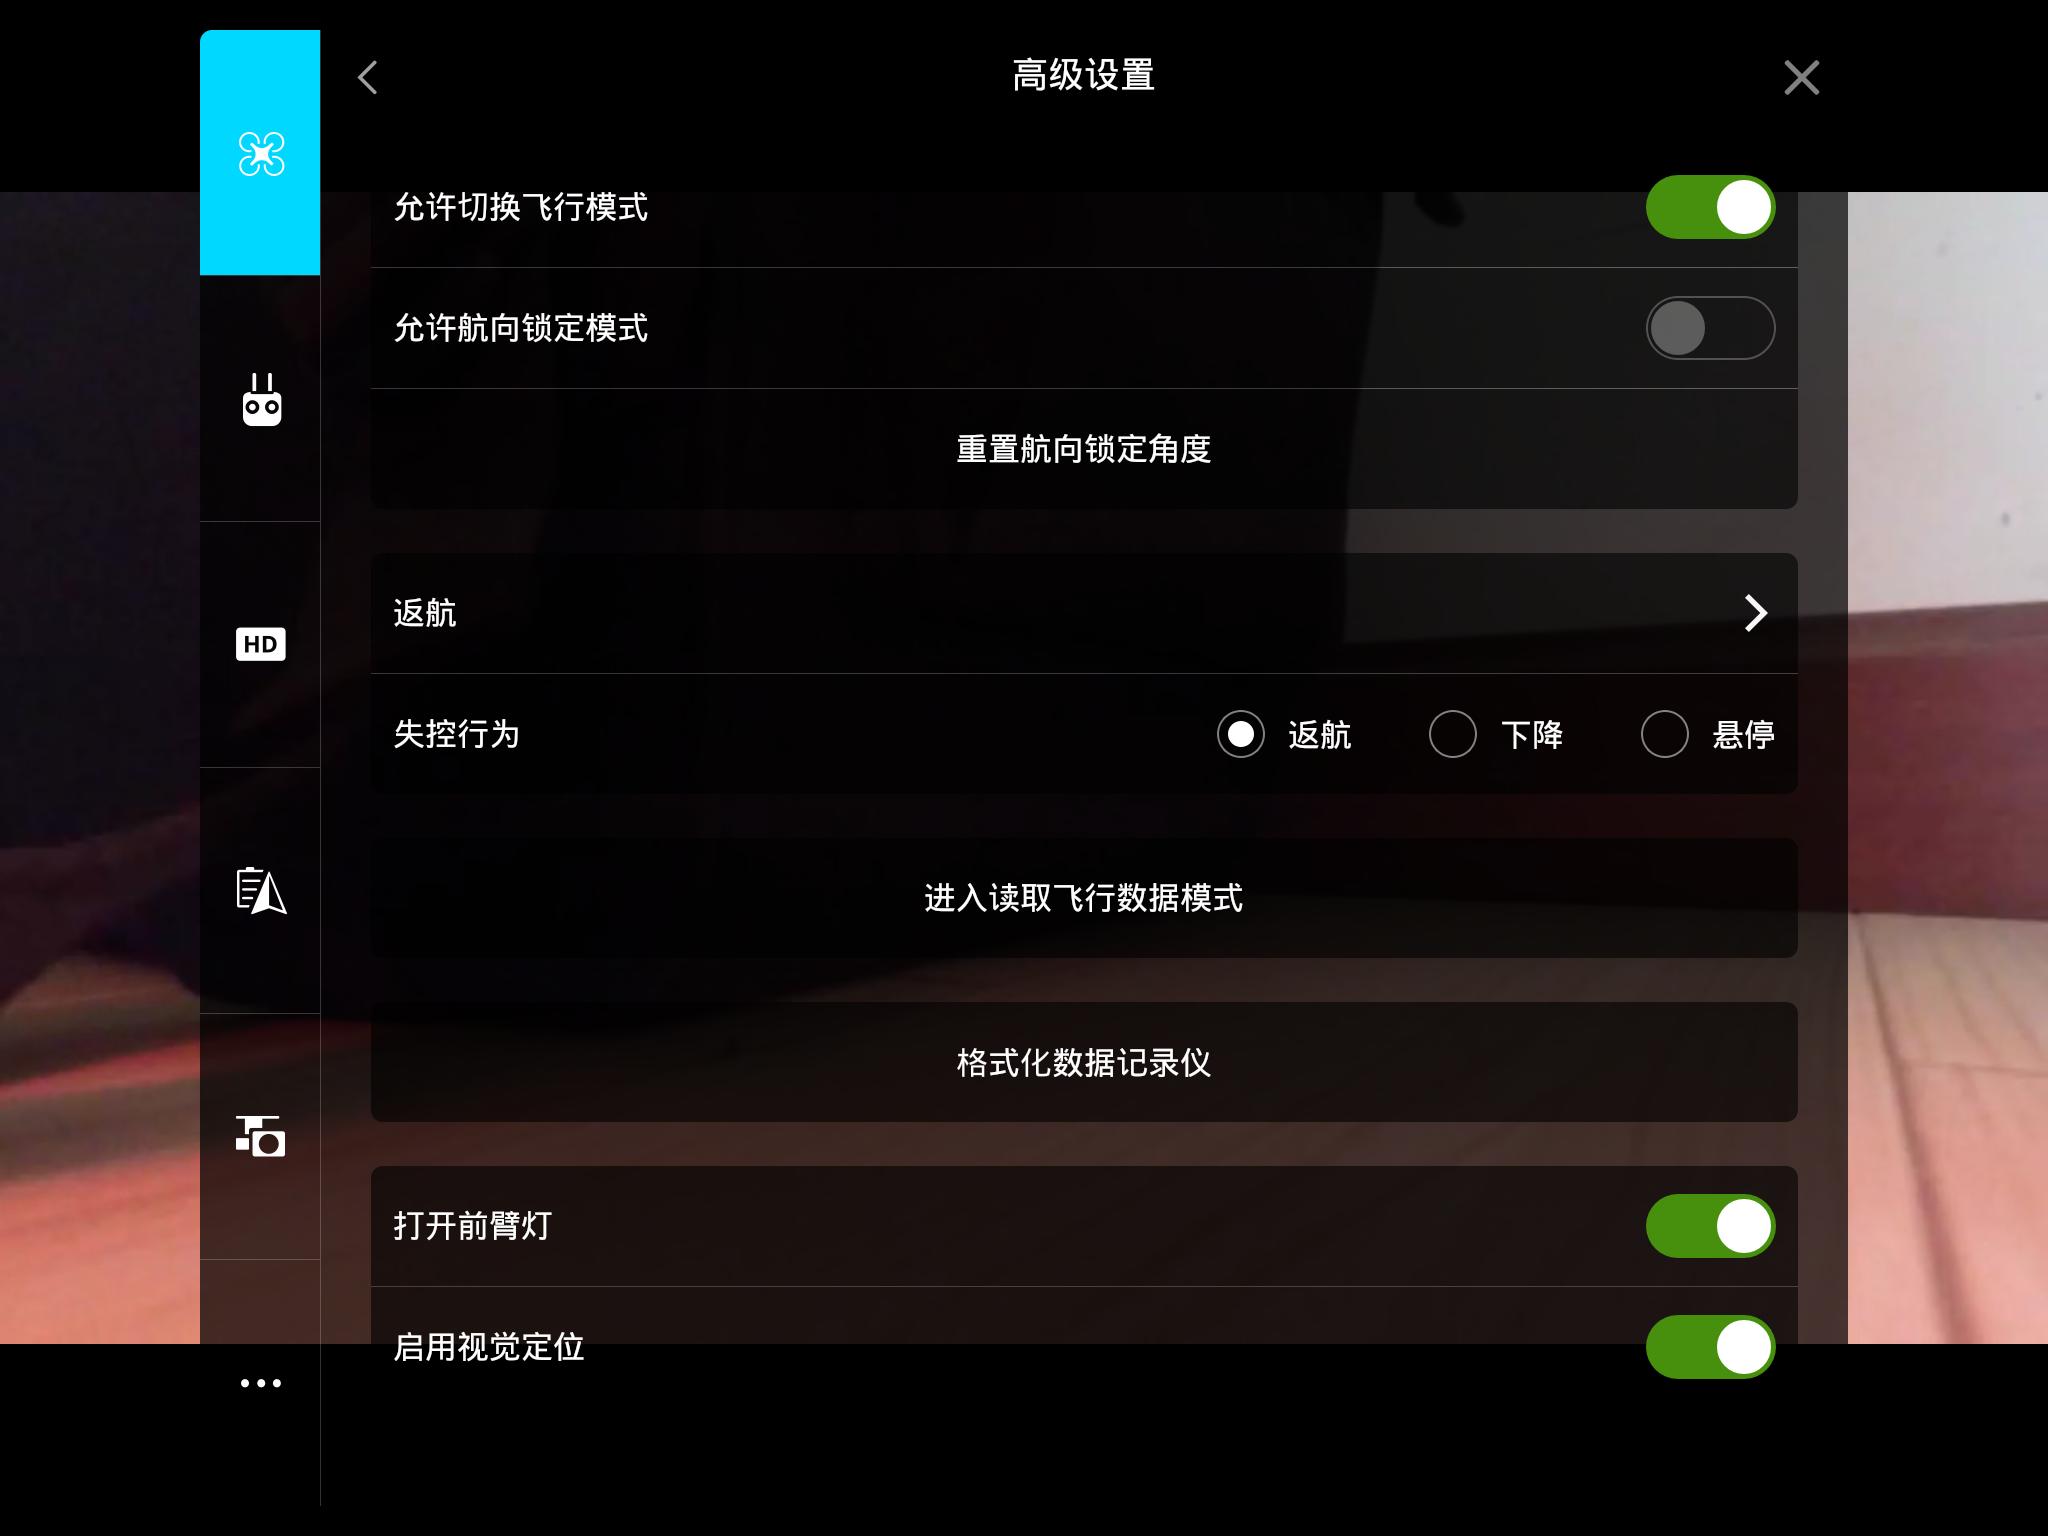 Screenshot_2015-09-08-15-41-41.png